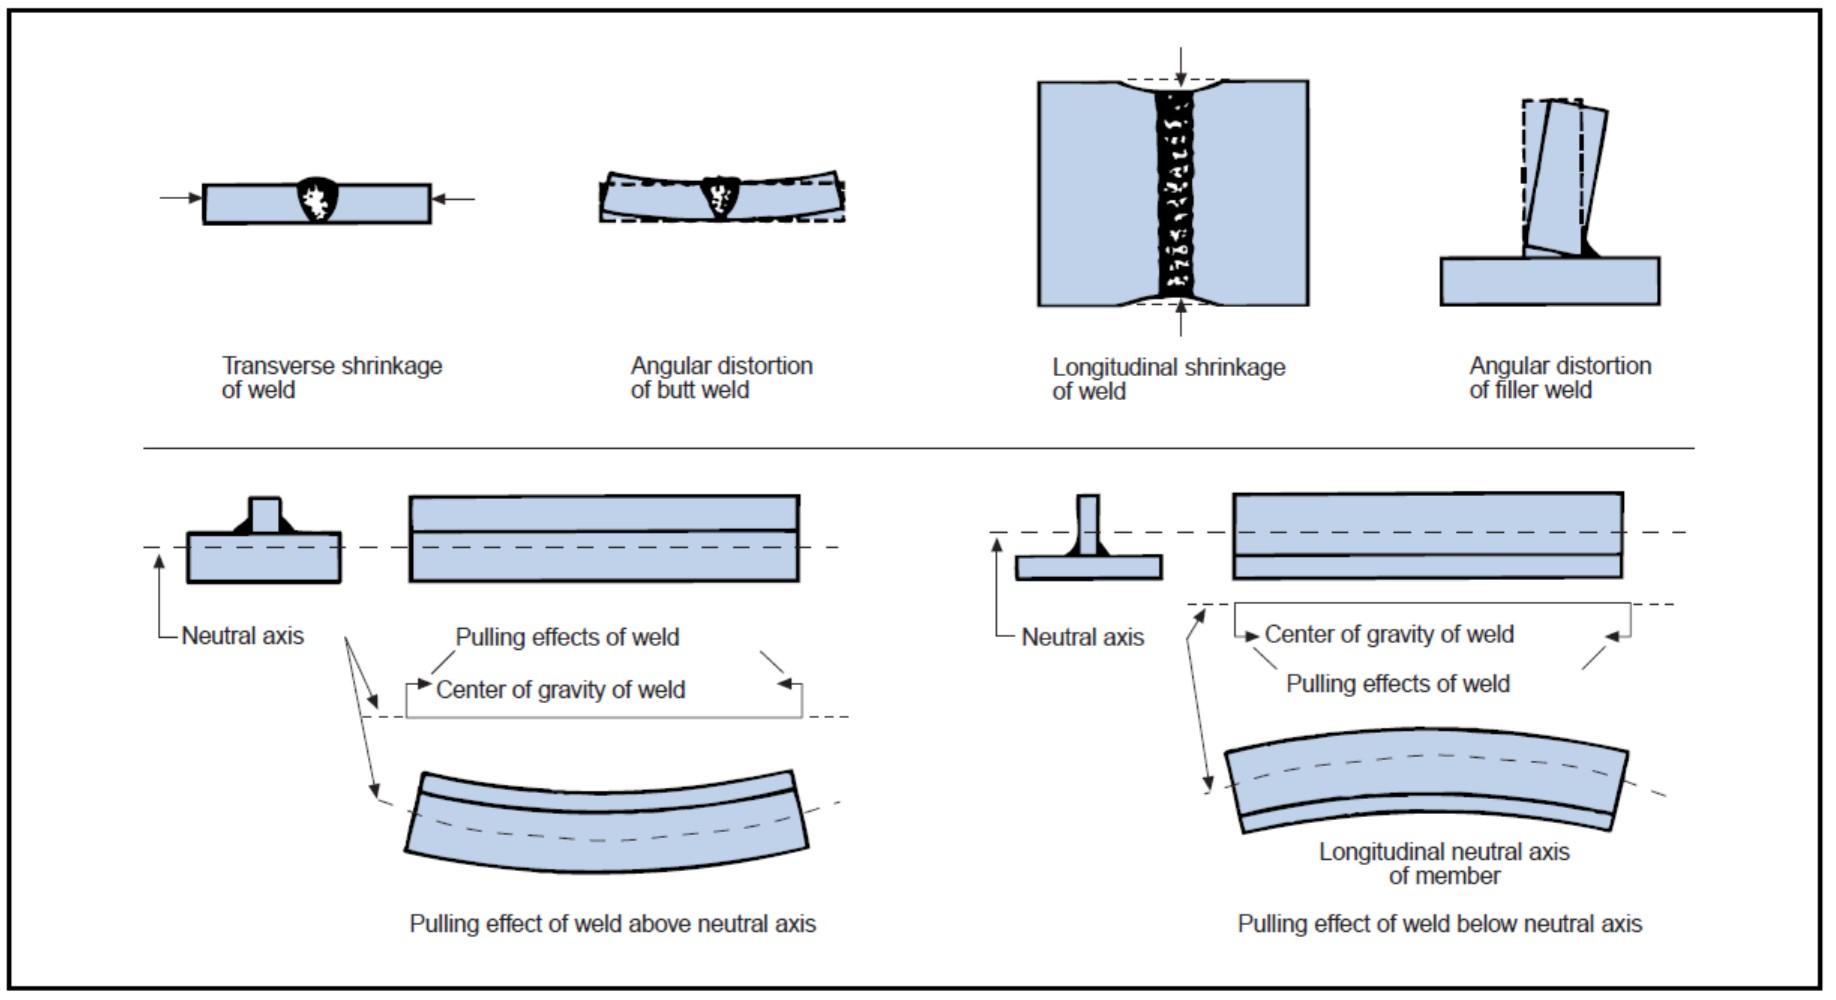 welding defects diagram wiring diagram expertswelding defects diagram wiring diagram schematics welding defects diagram